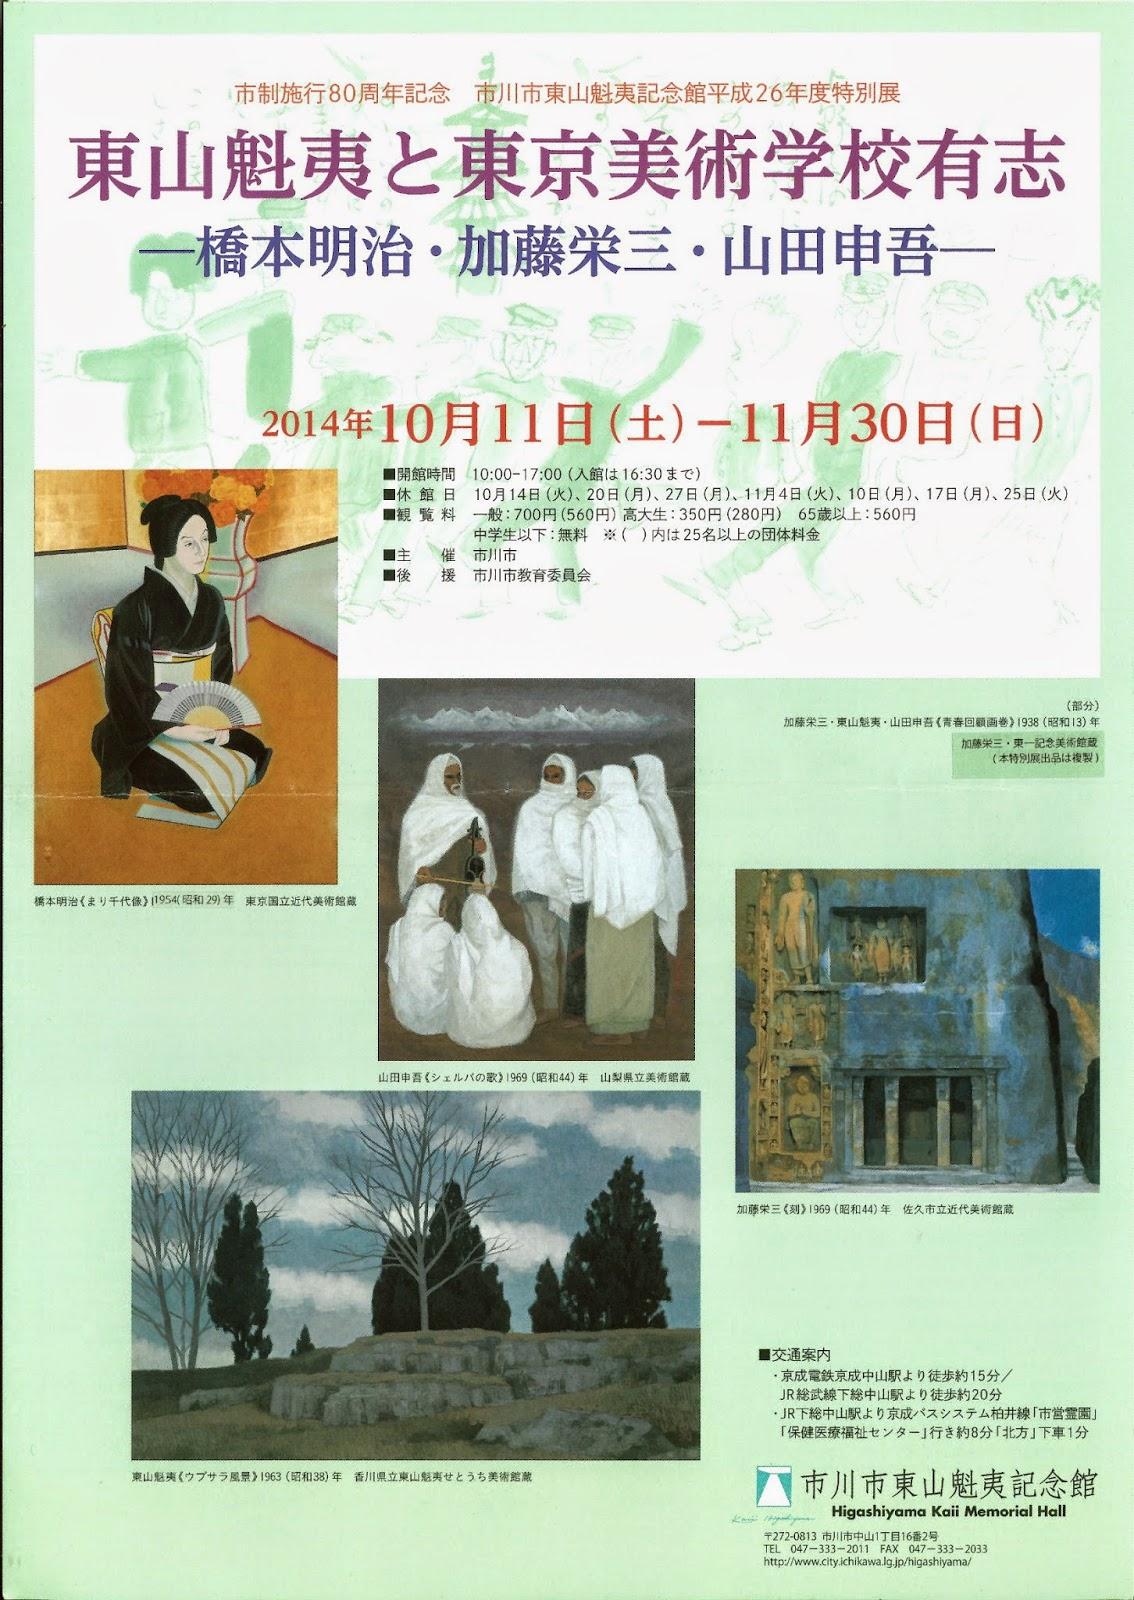 http://www.city.ichikawa.lg.jp/higashiyama/003.html